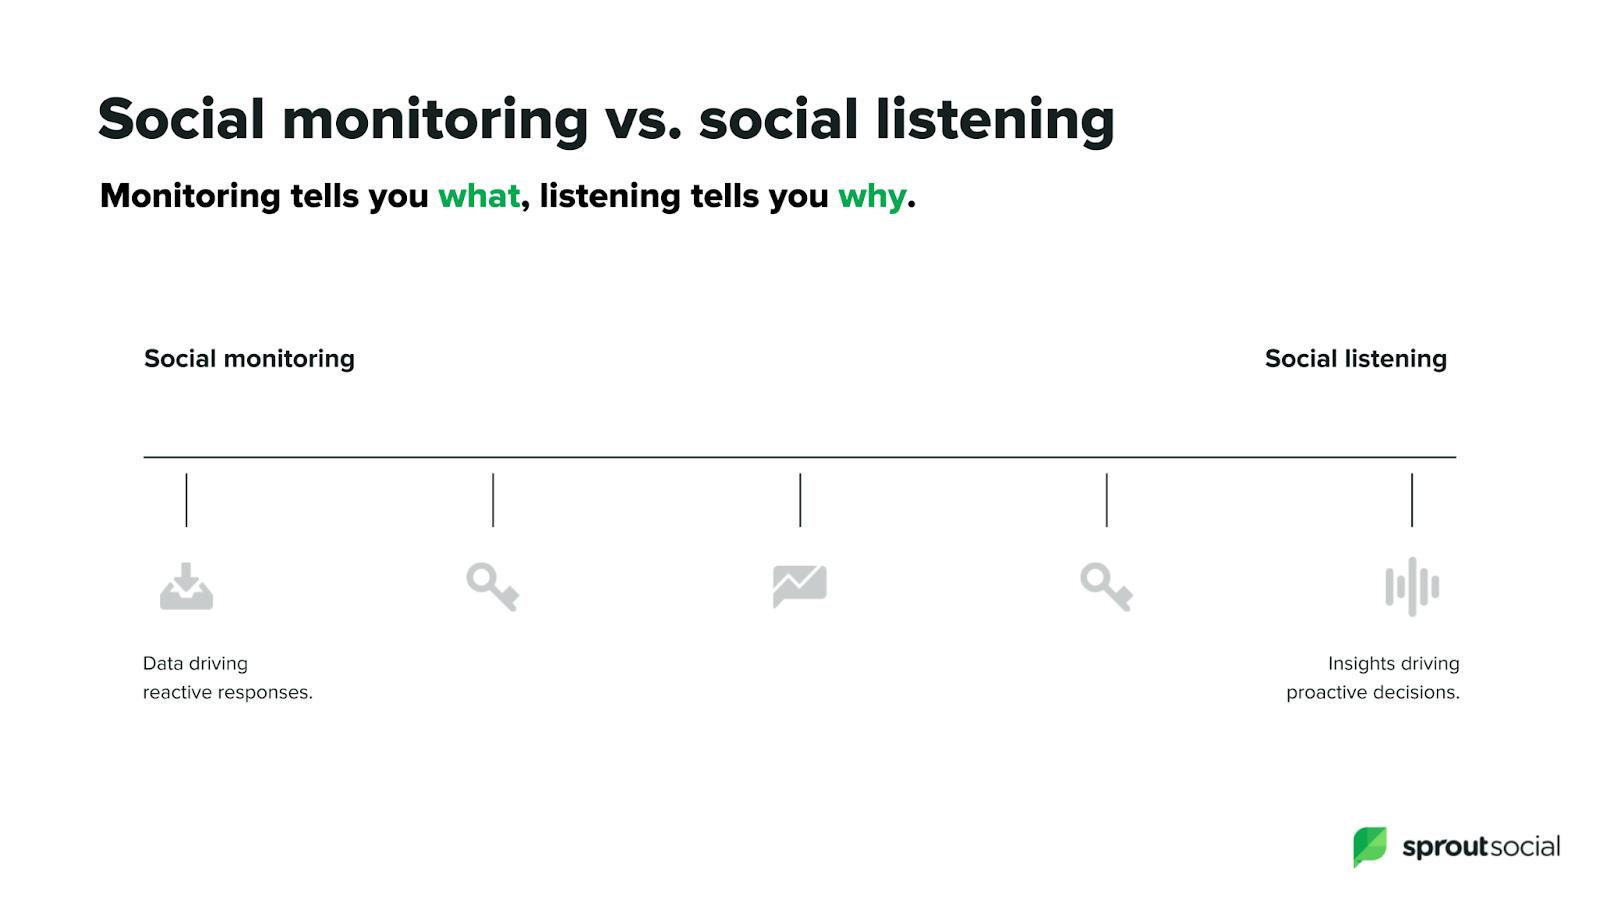 Social monitoring vs social listening by Sproutsocial